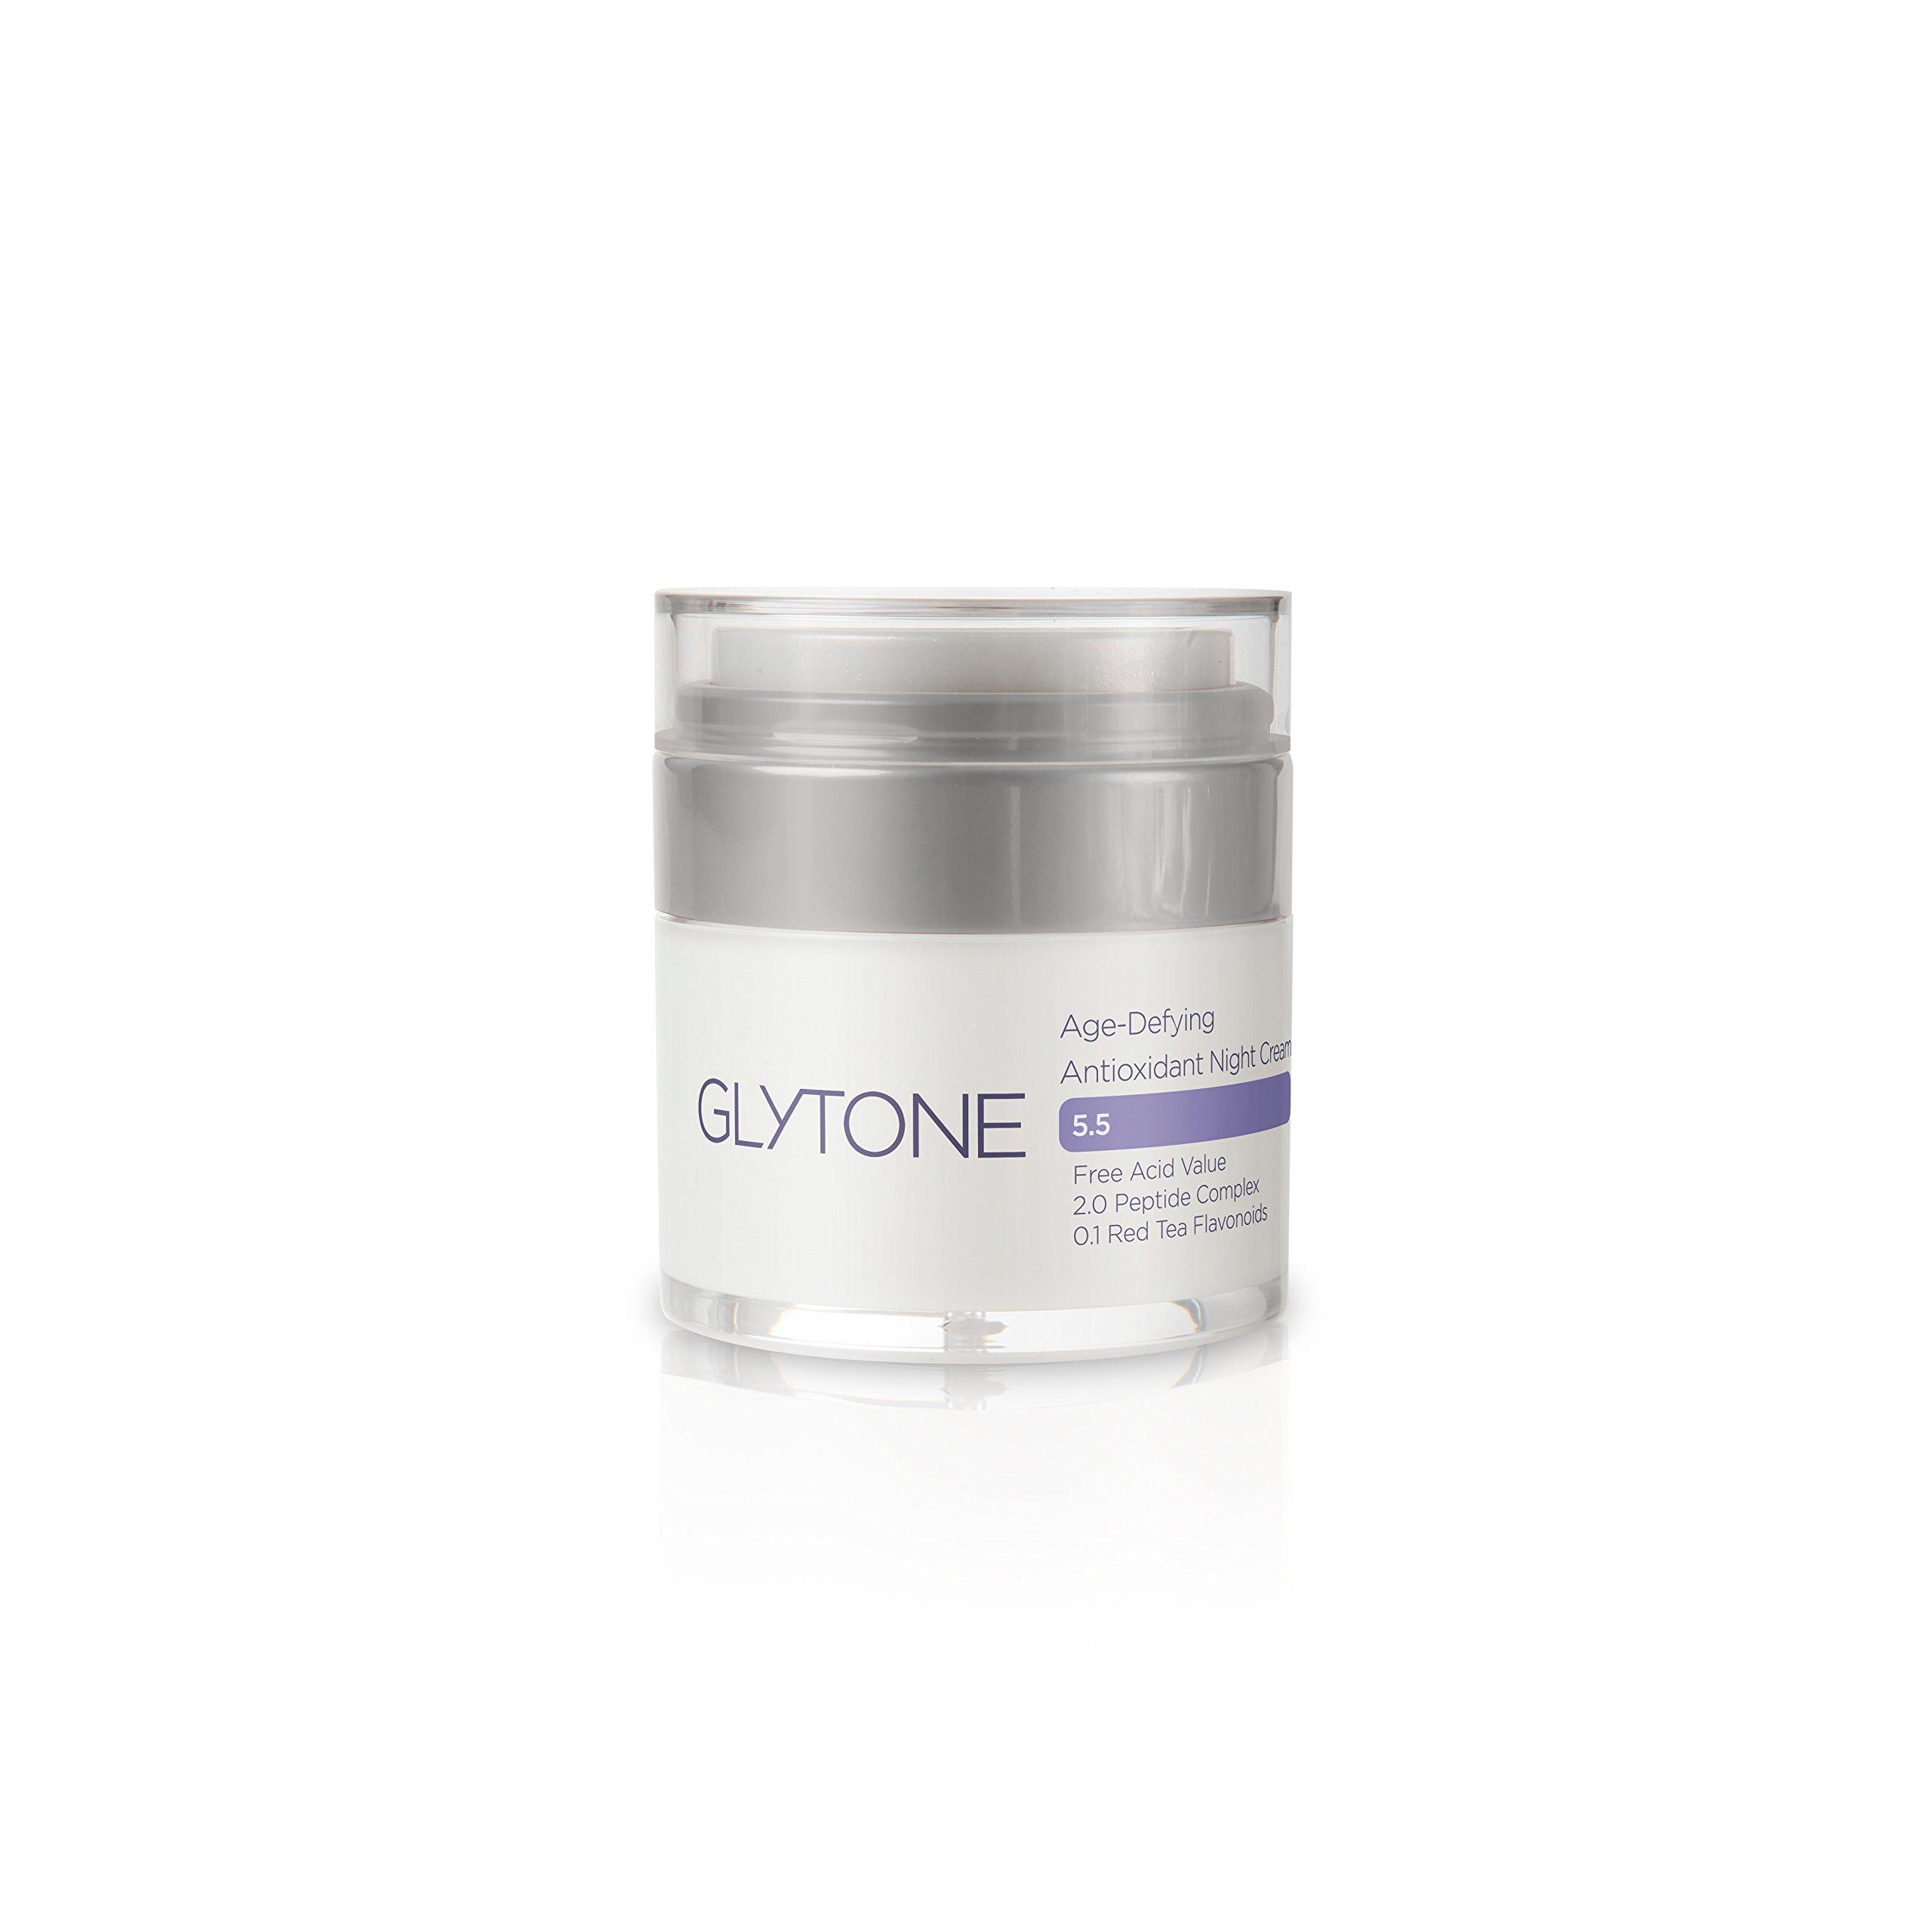 Glytone Age-Defying Antioxidant Night Cream, Glycolic Acid & Peptide Complex, Hydrates, Renews & Reduces Appearance of Fine Lines & Wrinkles, 1 oz.